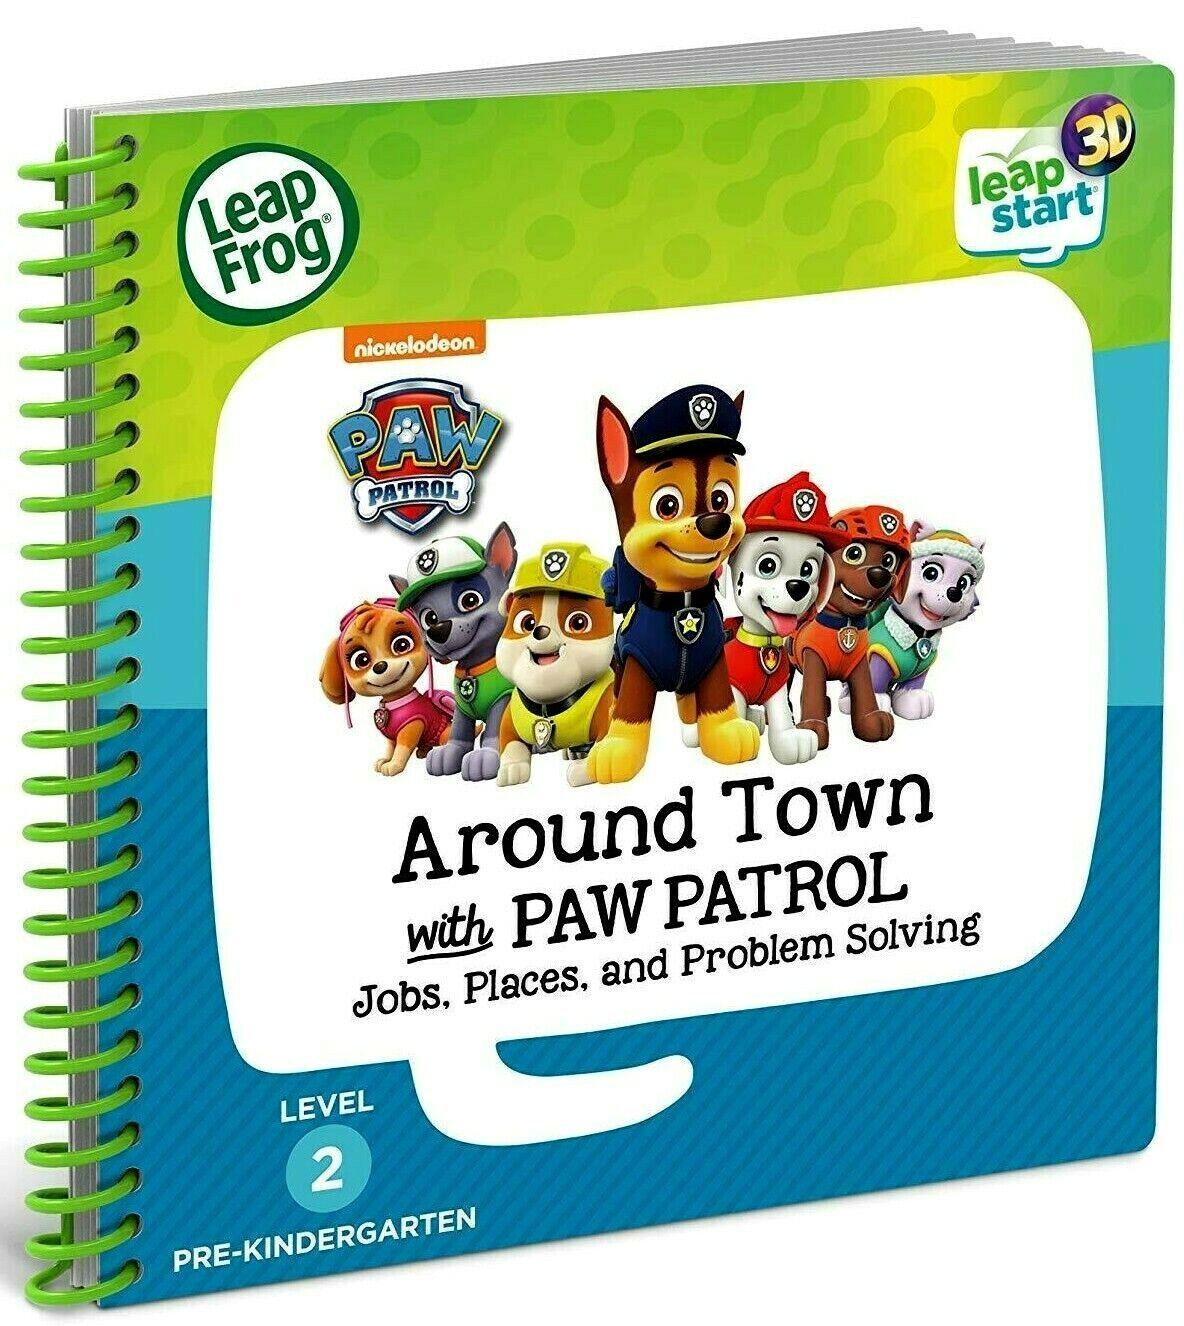 Paw Patrol Activity Book 3D Enhanced Leapstart Preschool Aro